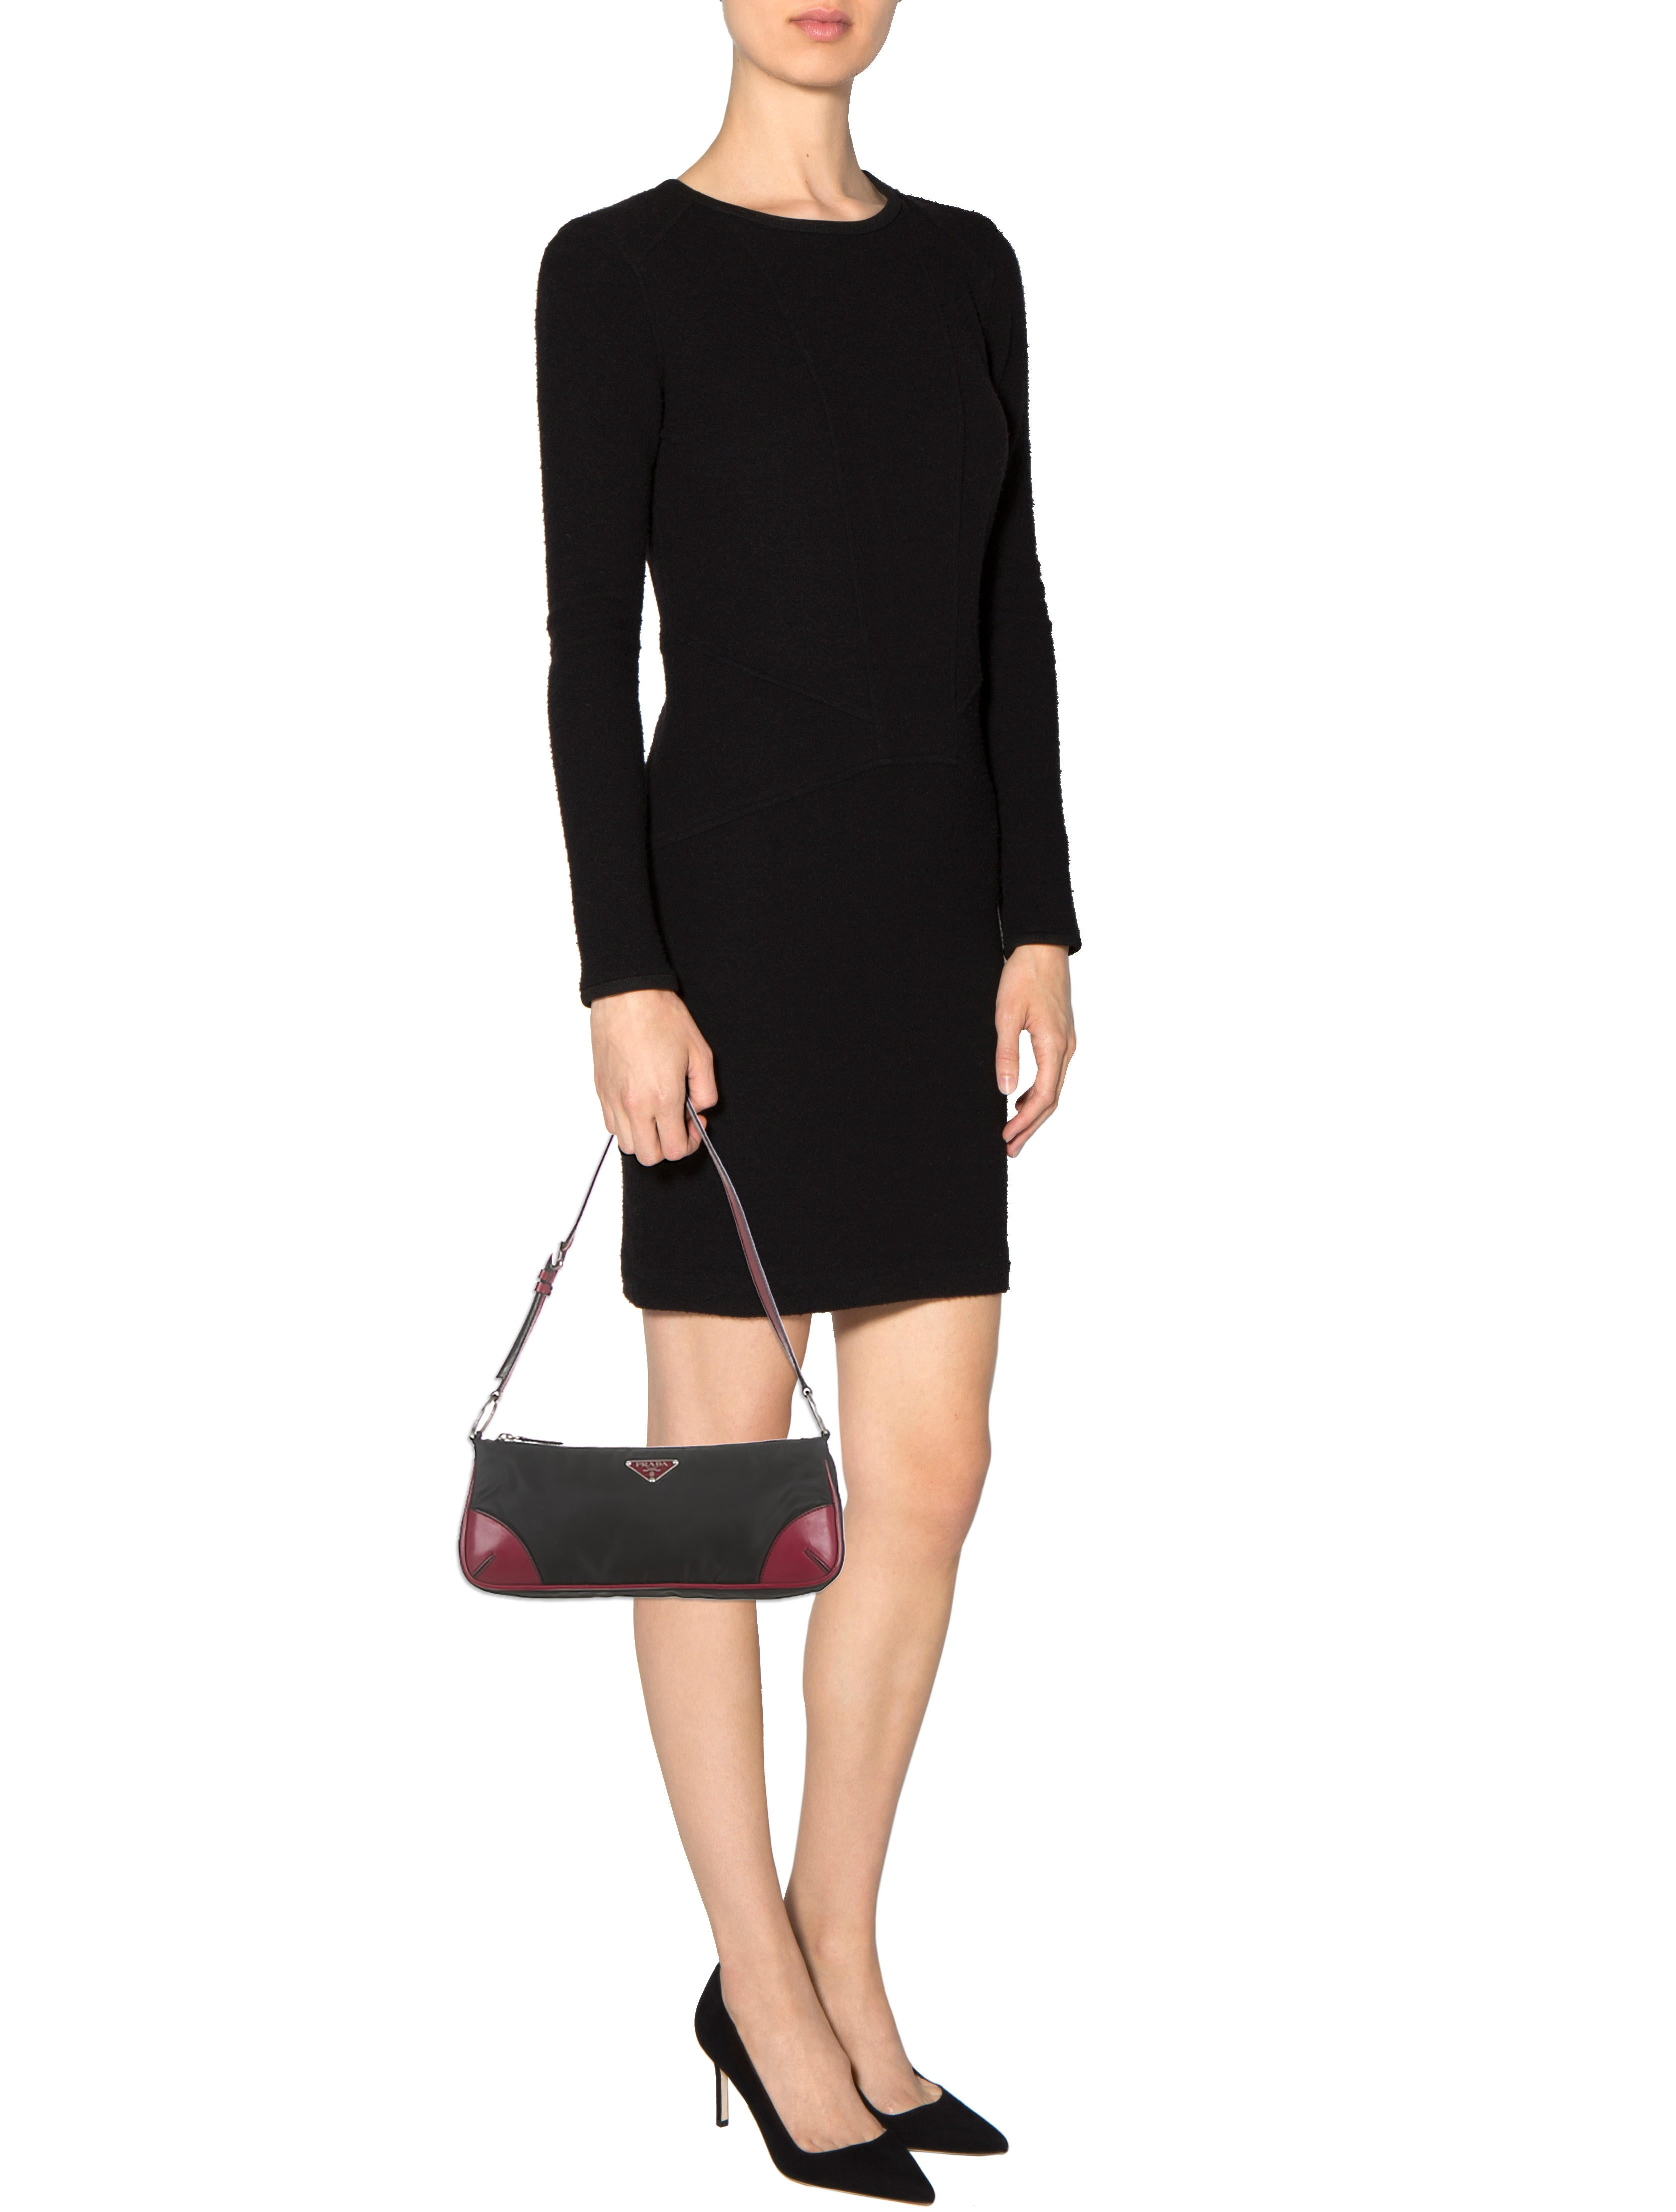 Prada Tessuto Pochette - Handbags - PRA57717 | The RealReal